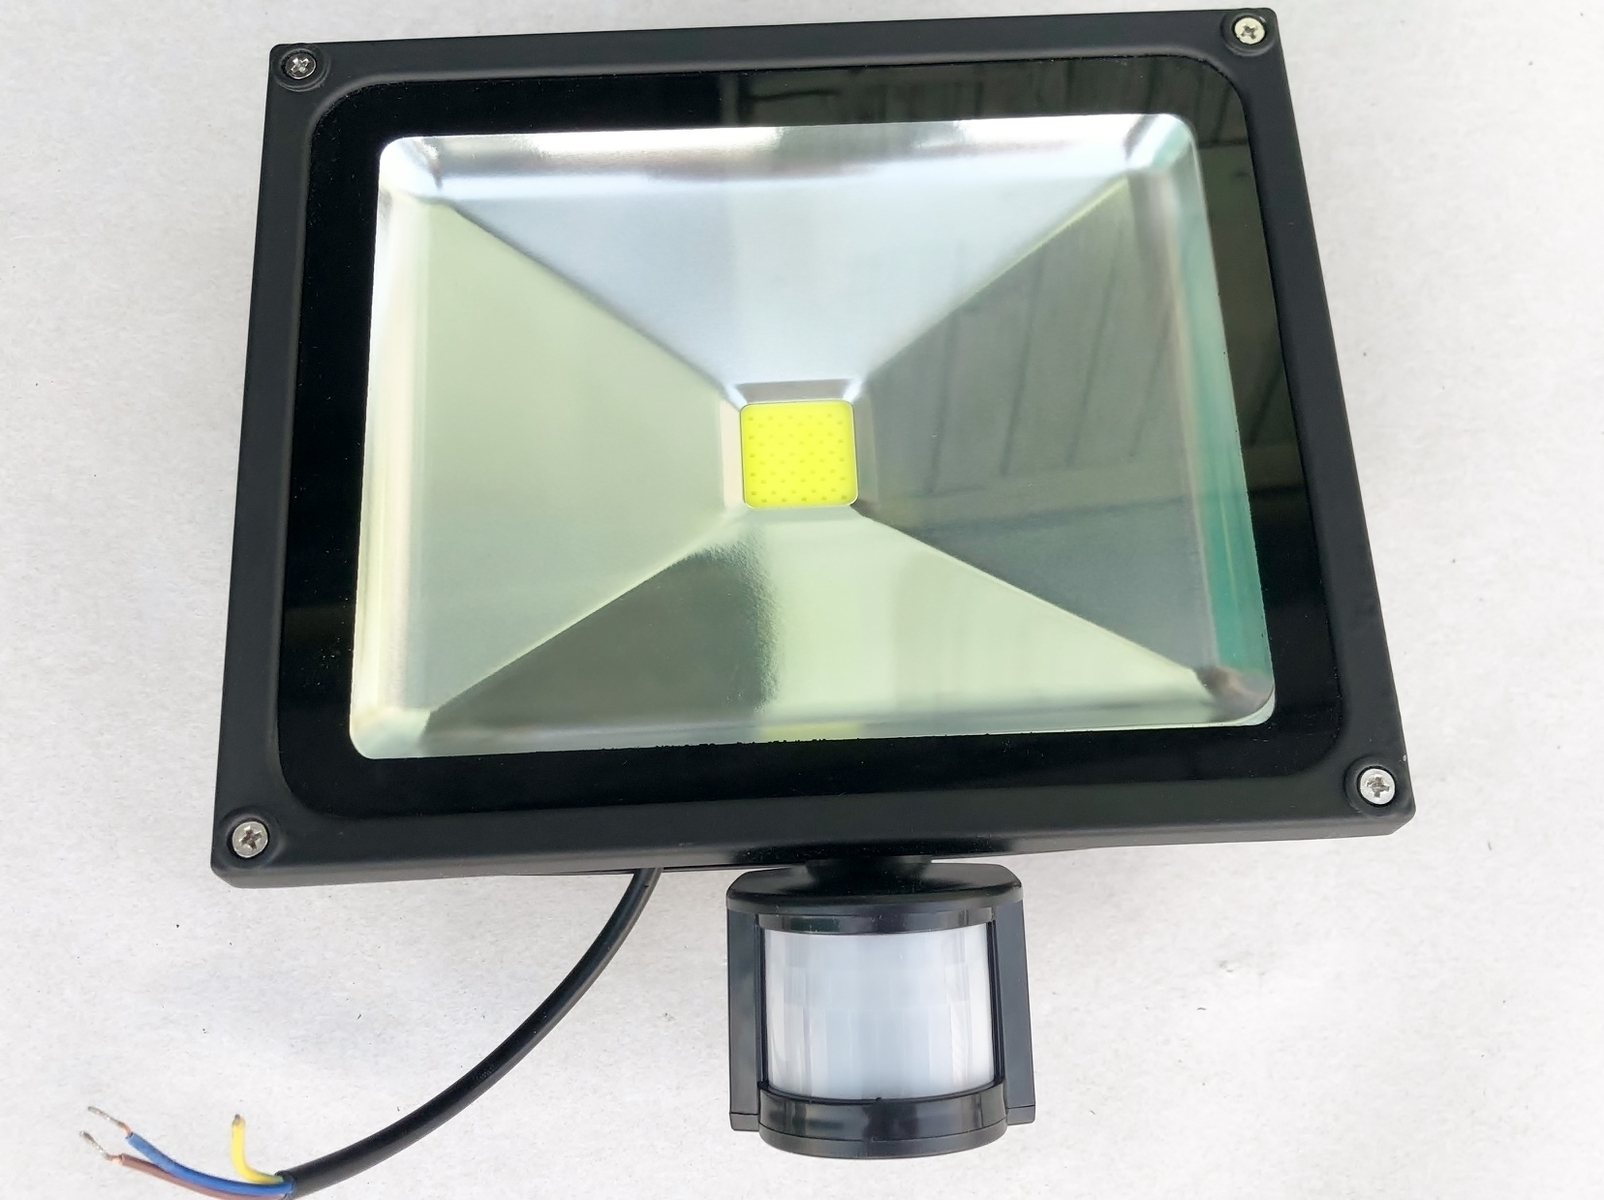 LED  prozektor 30 W, NL-F-30W-I, Pluvo, liikumisanduriga